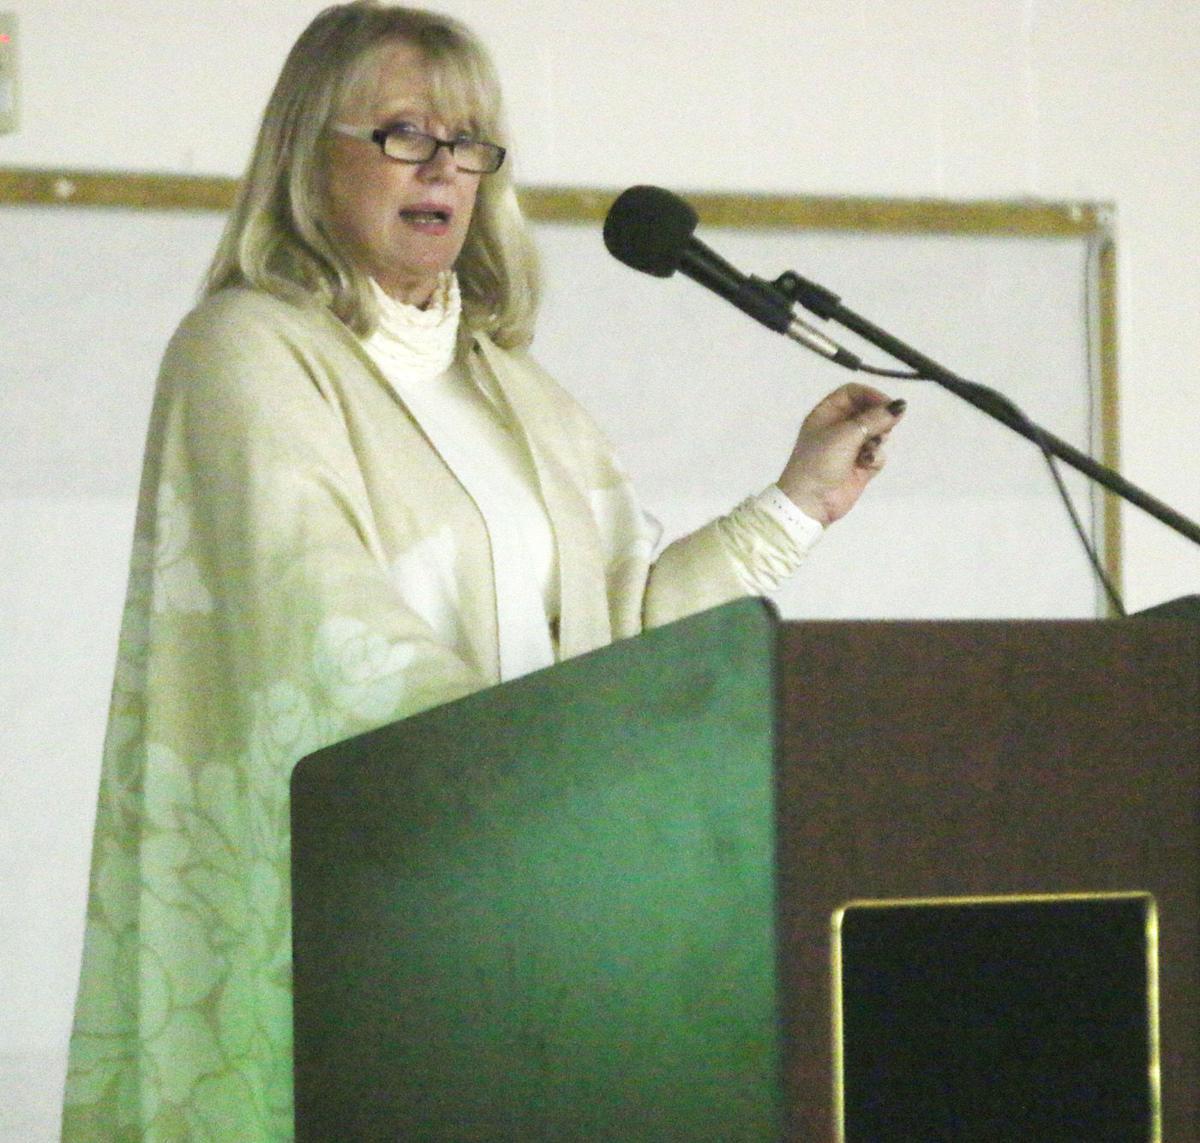 Dr. Norman at podium